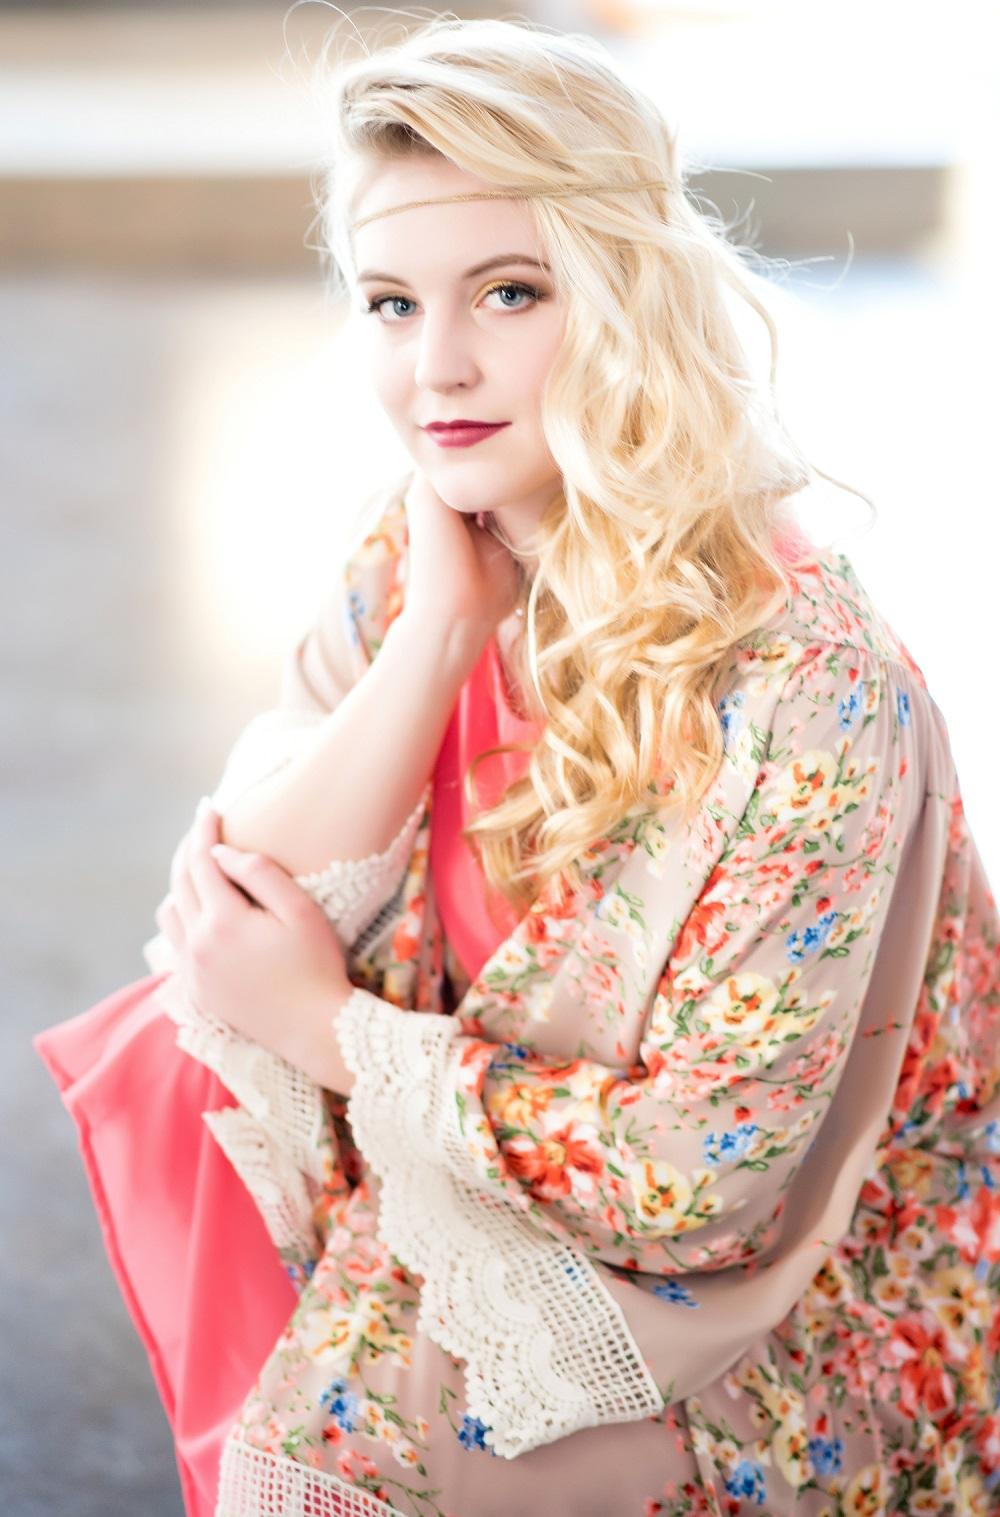 Angelique Verver Sioux Falls Makeup Artist. Julie Prairie Photography